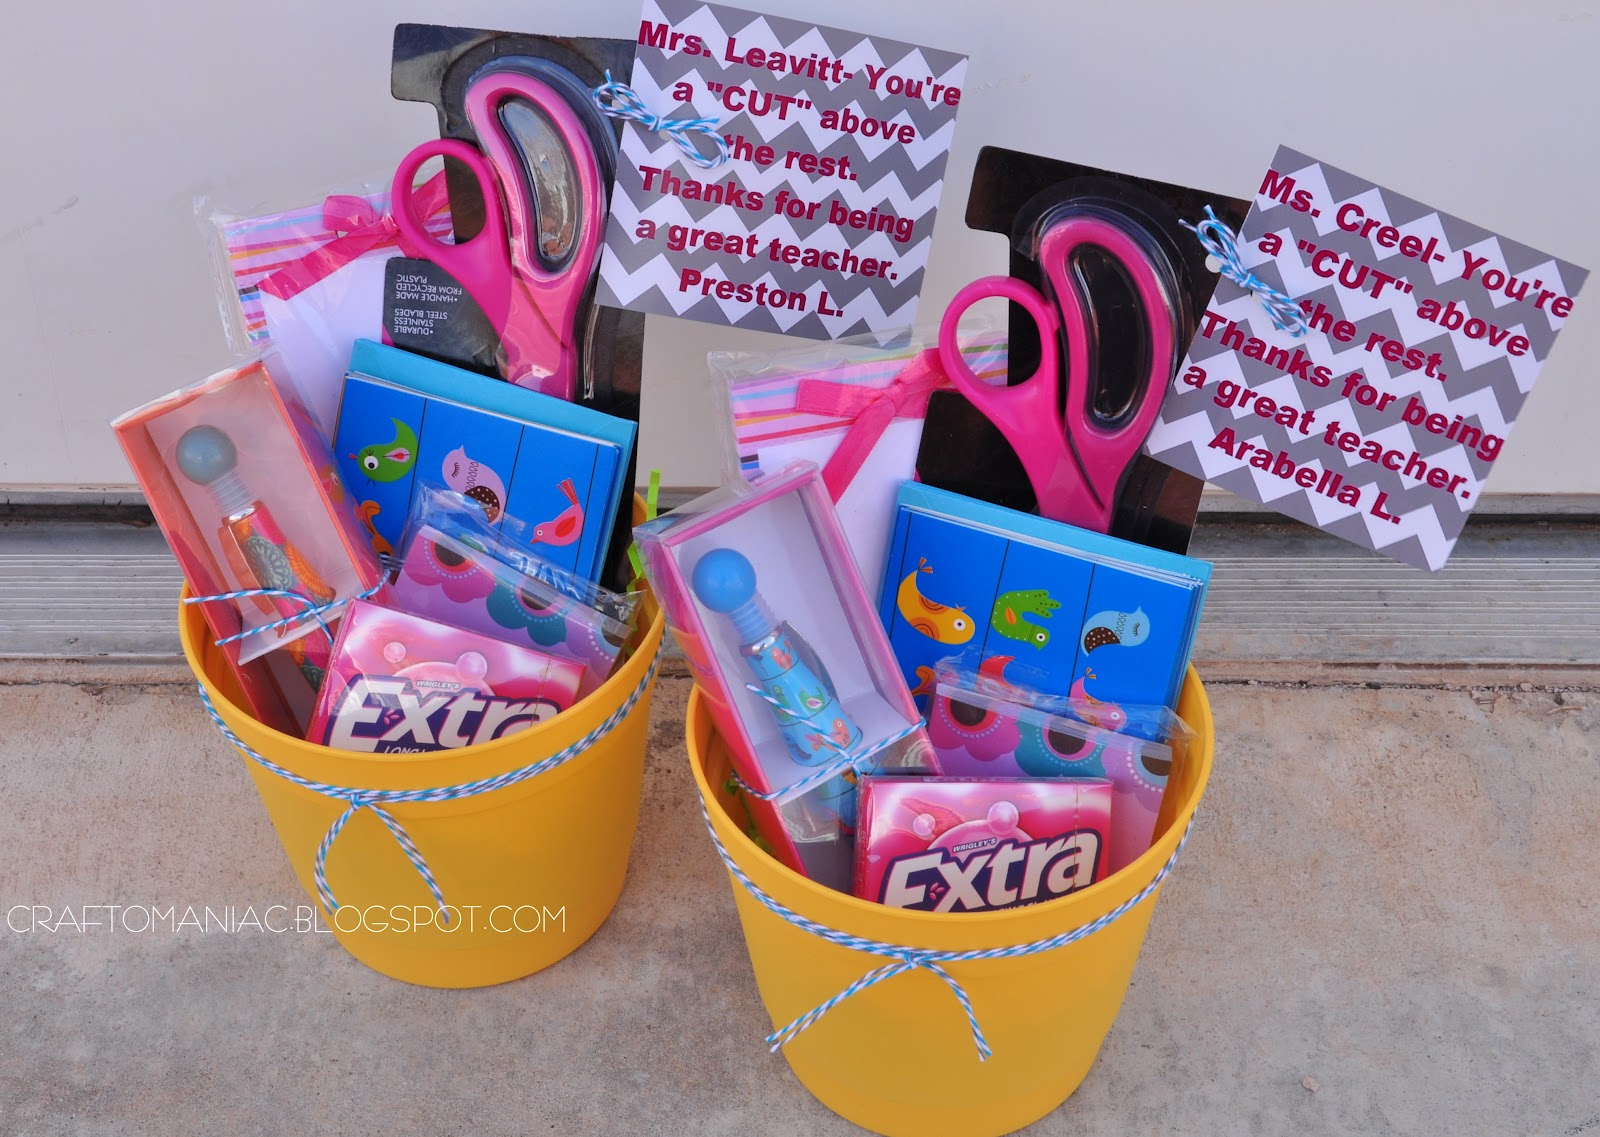 Teacher Appreciation Gift Idea - Craft-O-Maniac